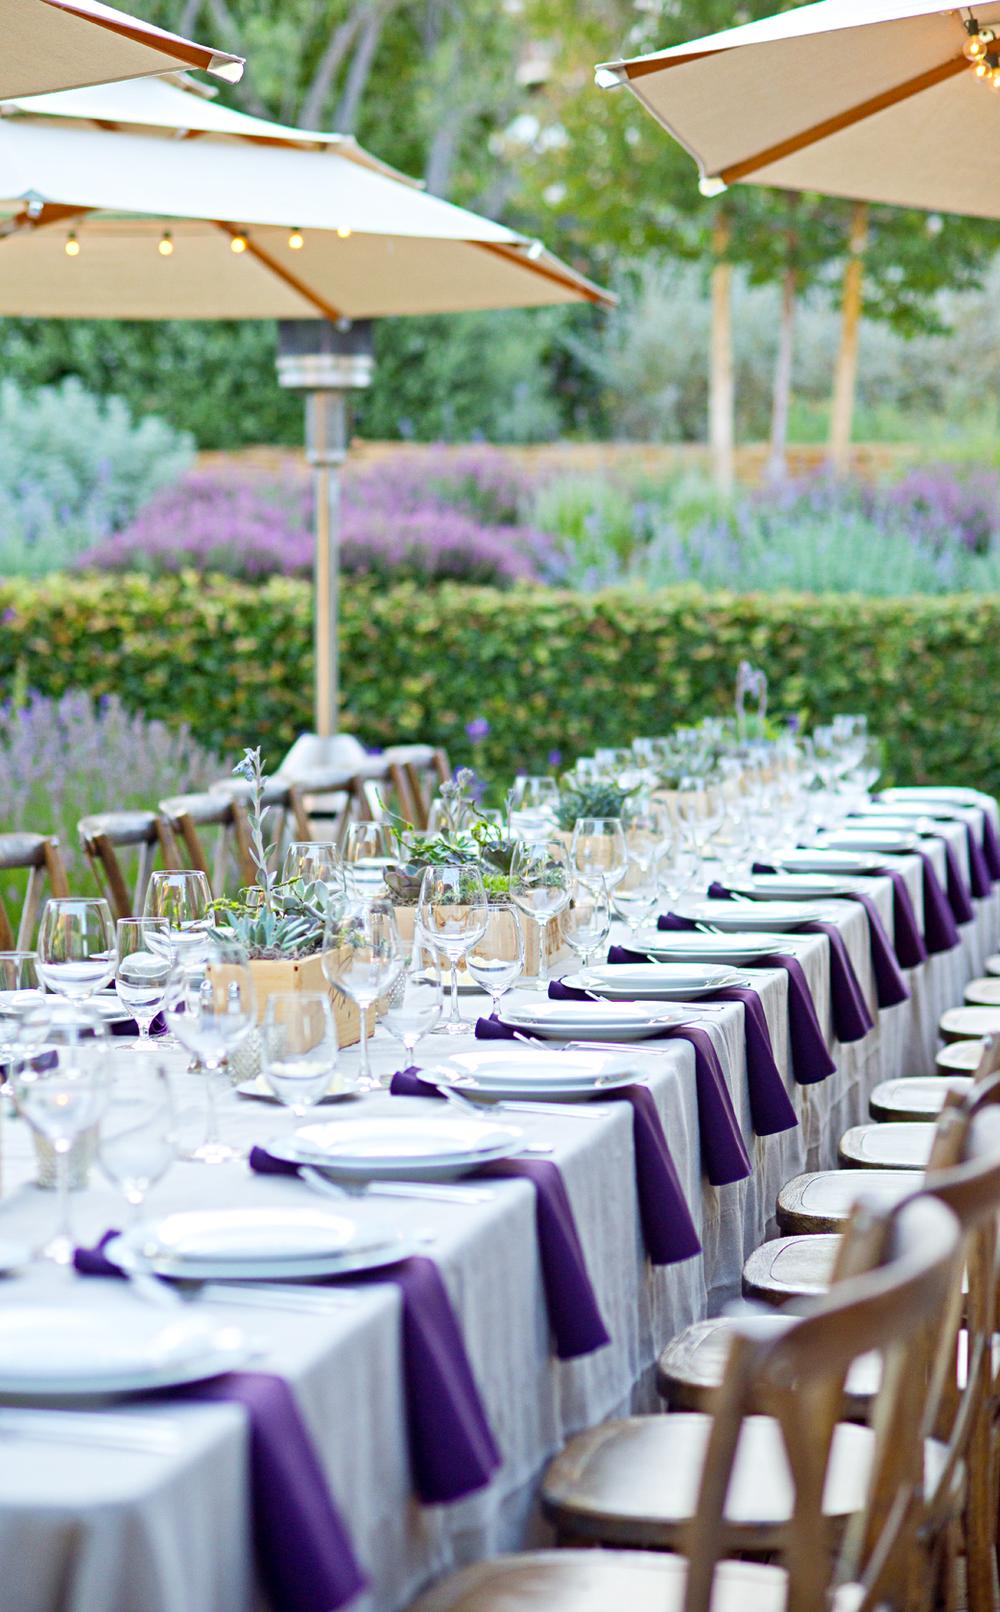 Wine Country Tablesetting | Mysplendidliving.com | #tablescape